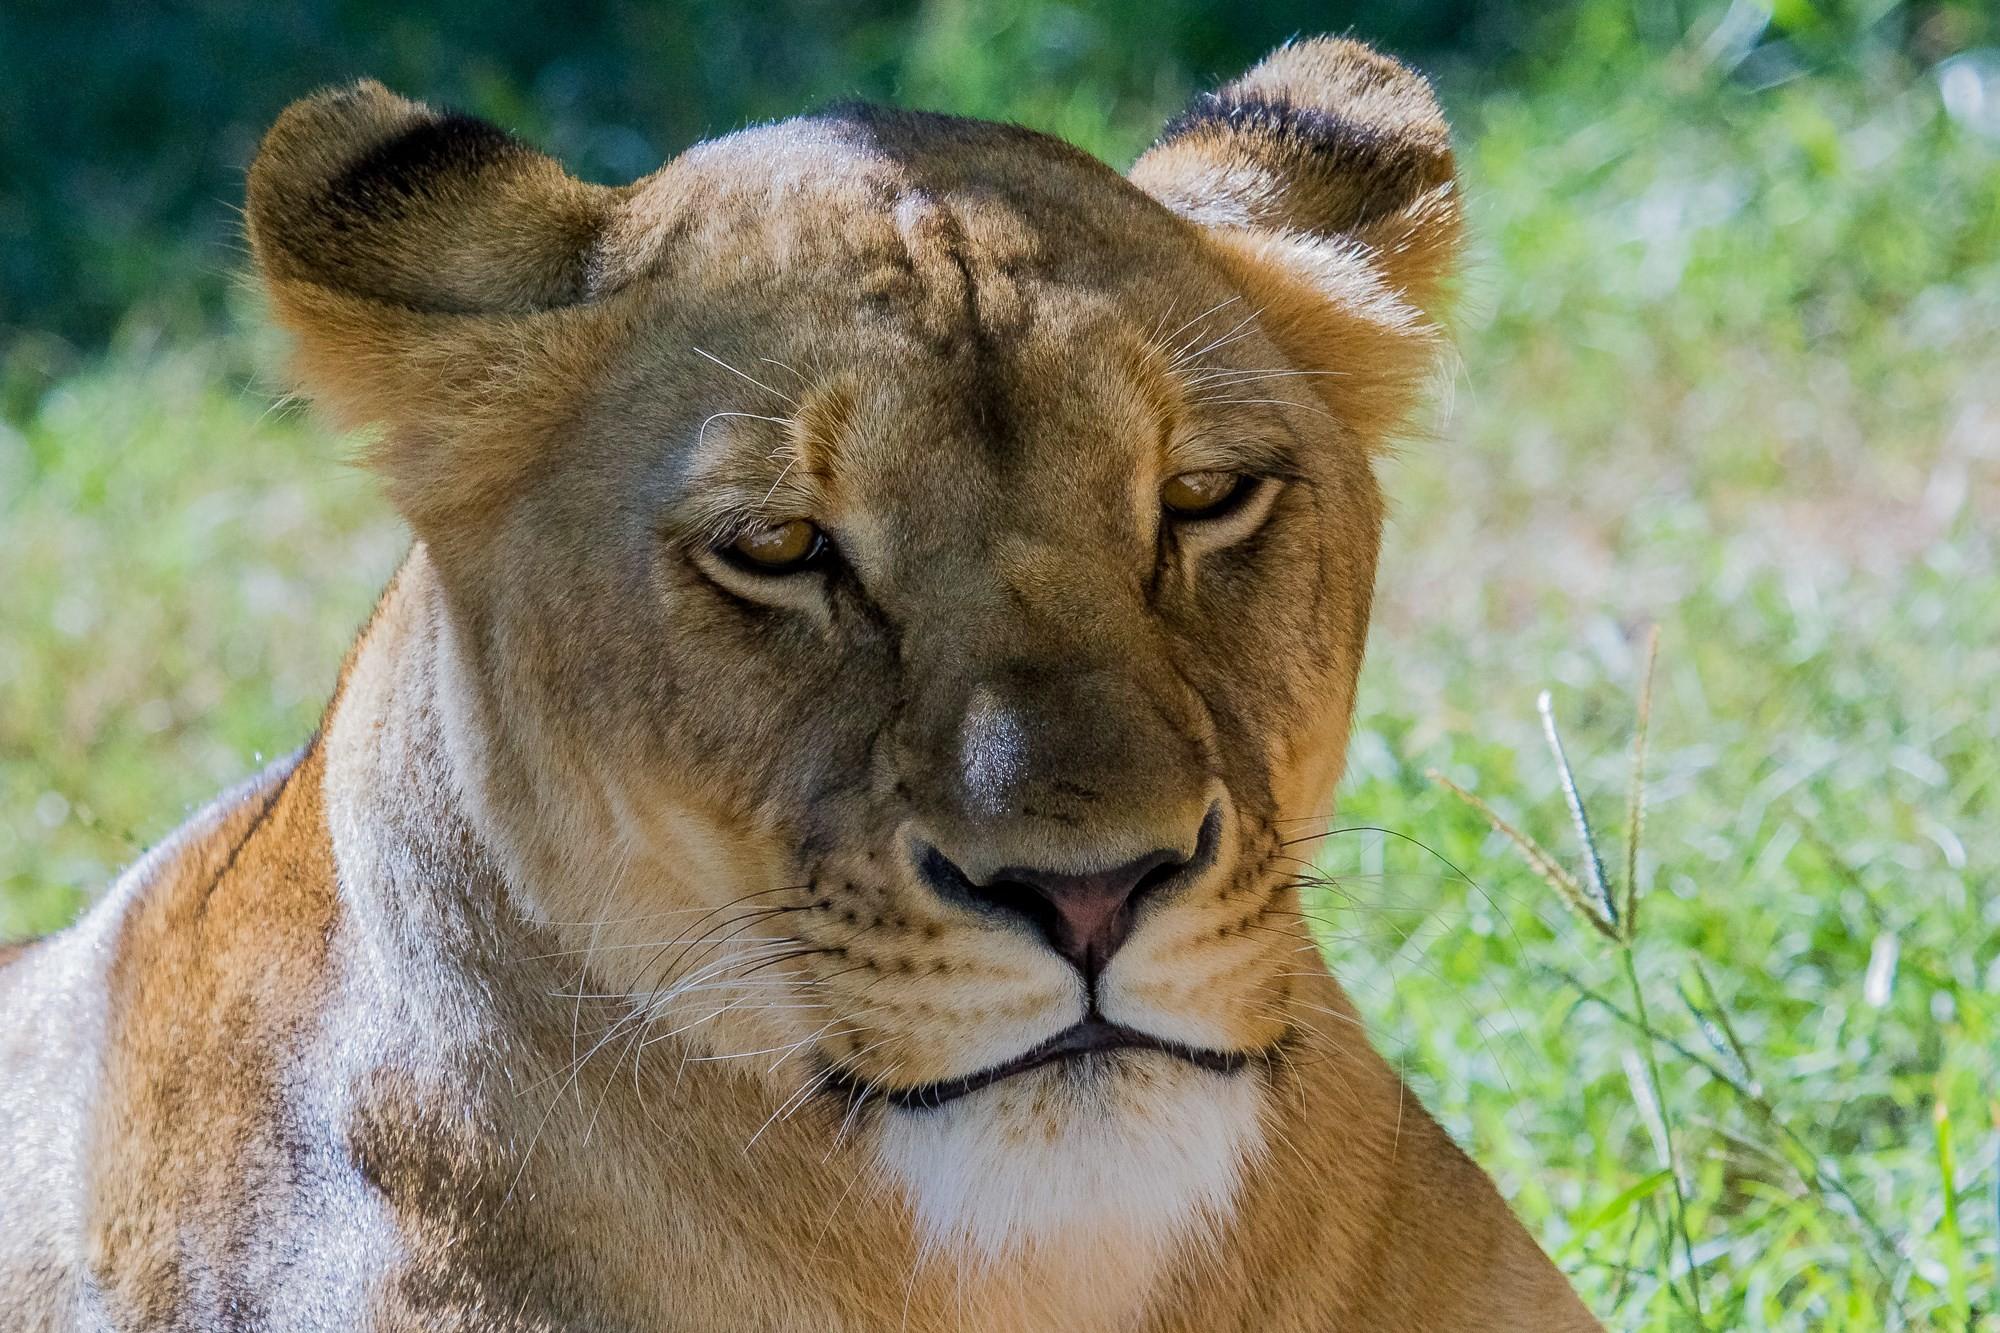 lion screensavers backgrounds, Winfred Sinclair 2017-03-05